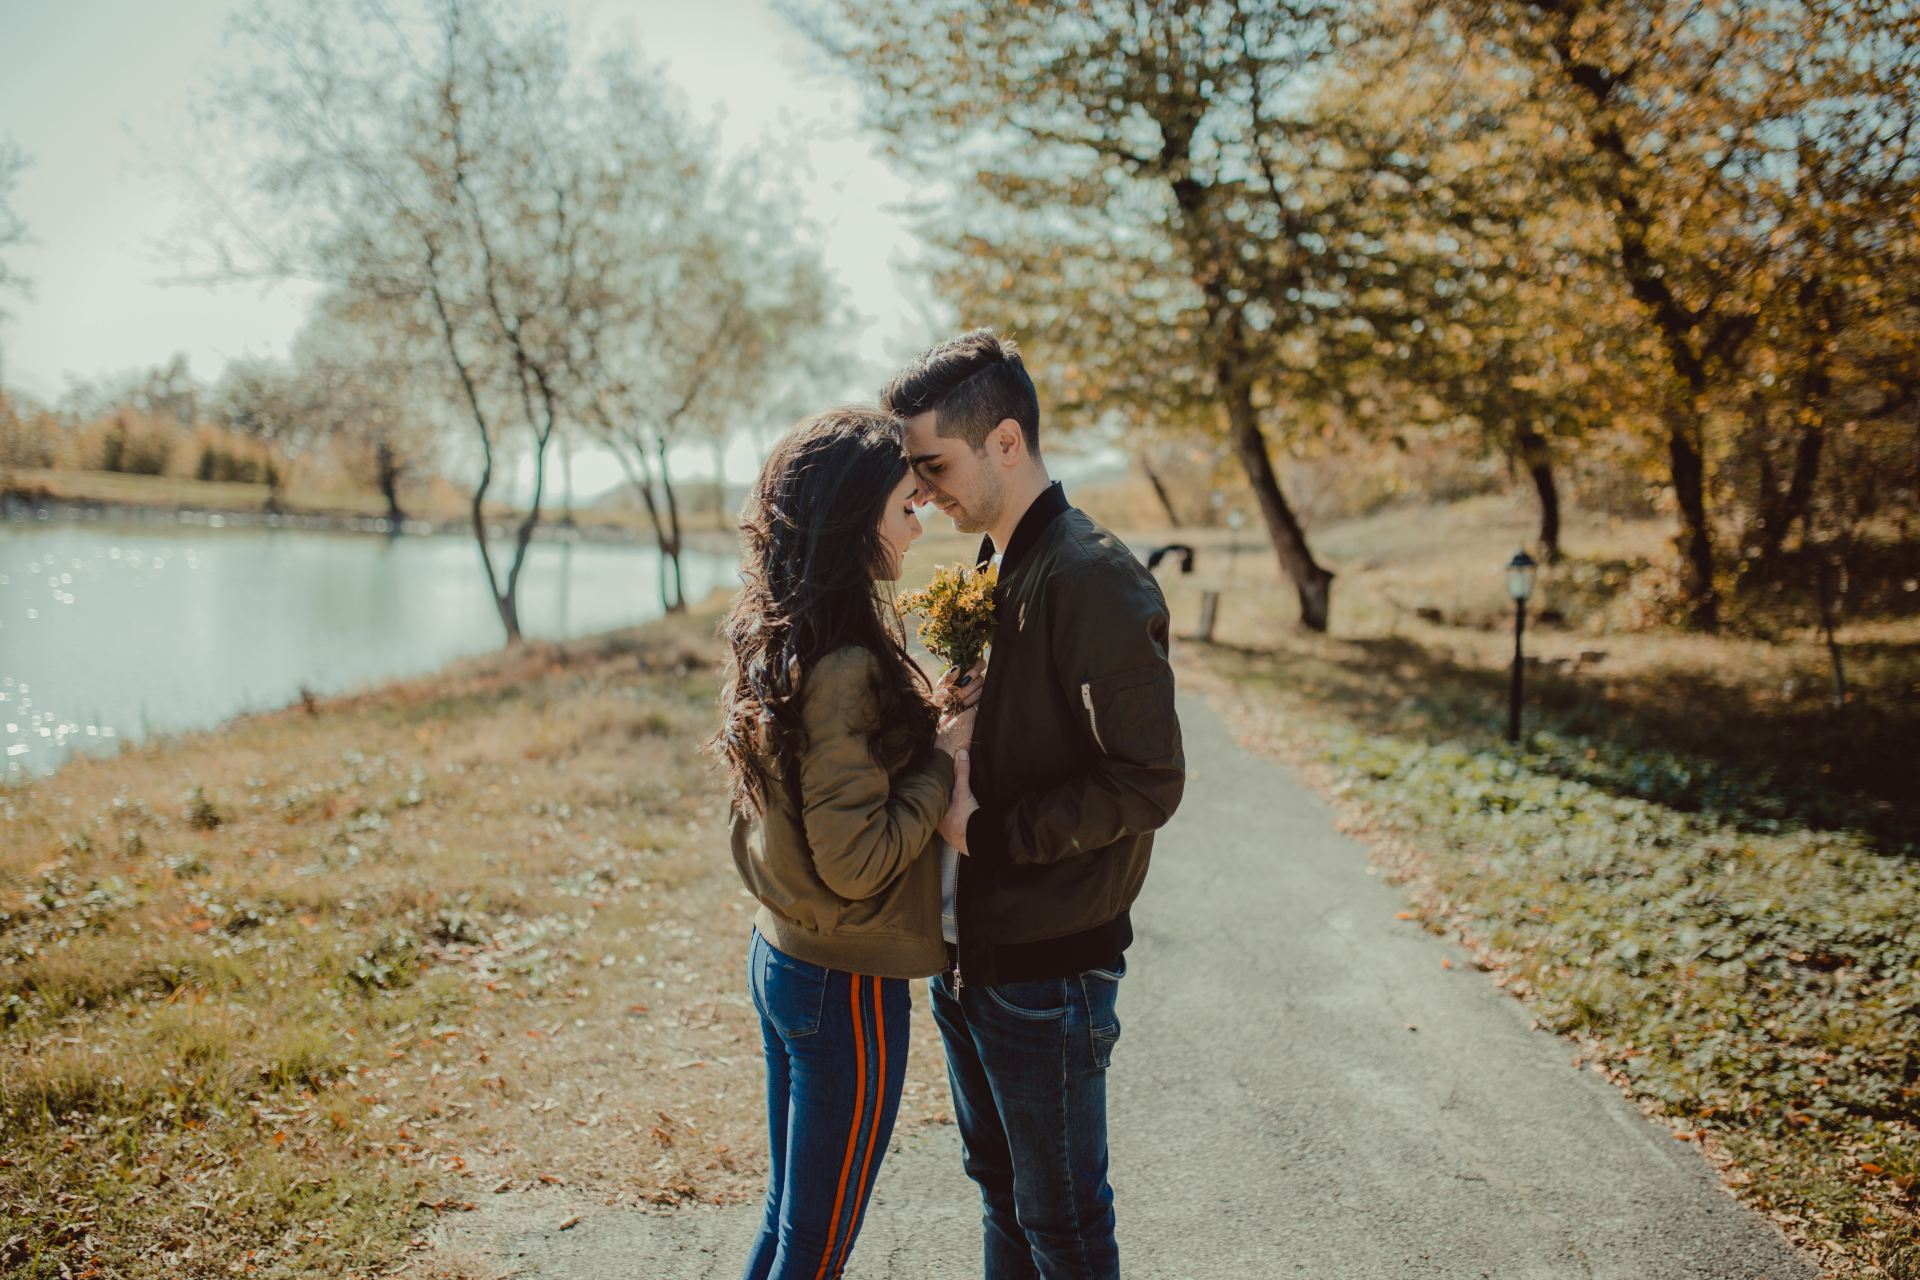 Don't Run Away When The Love Feels Stale